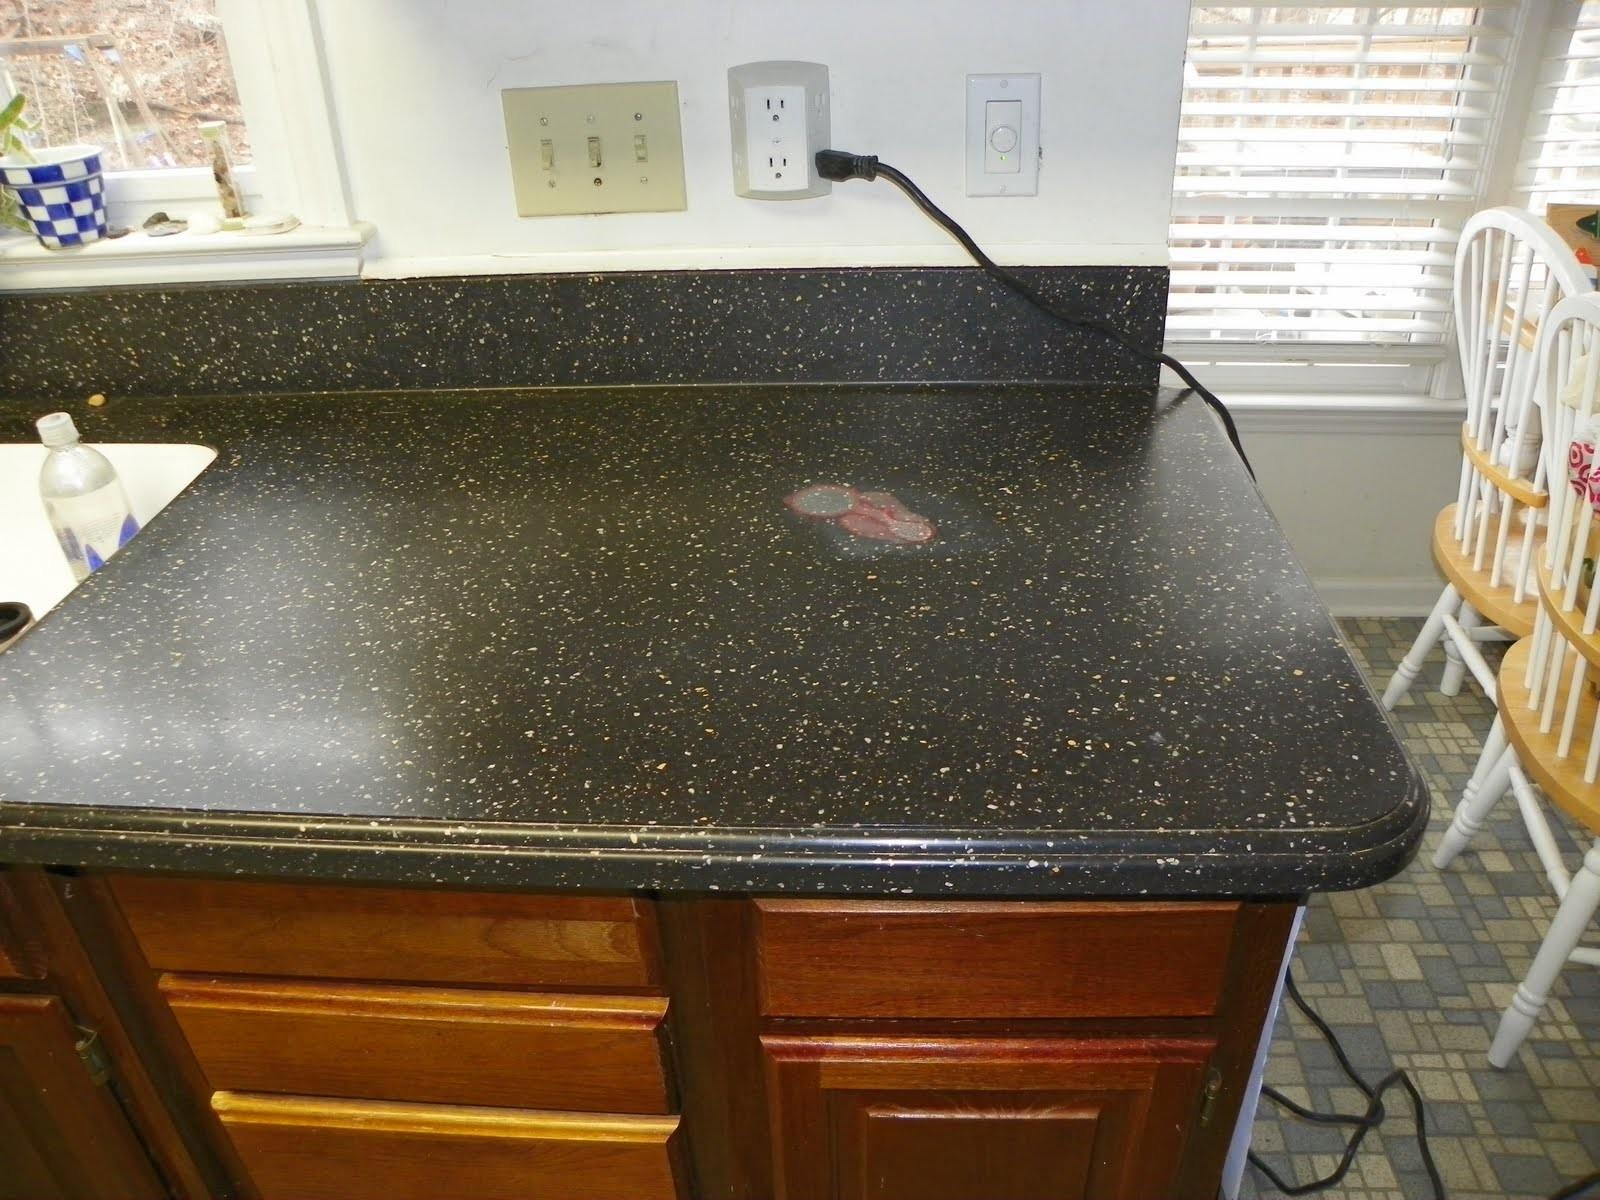 corian countertop heat damage  The Solid Surface Countertop Repair Blog: Corian ..